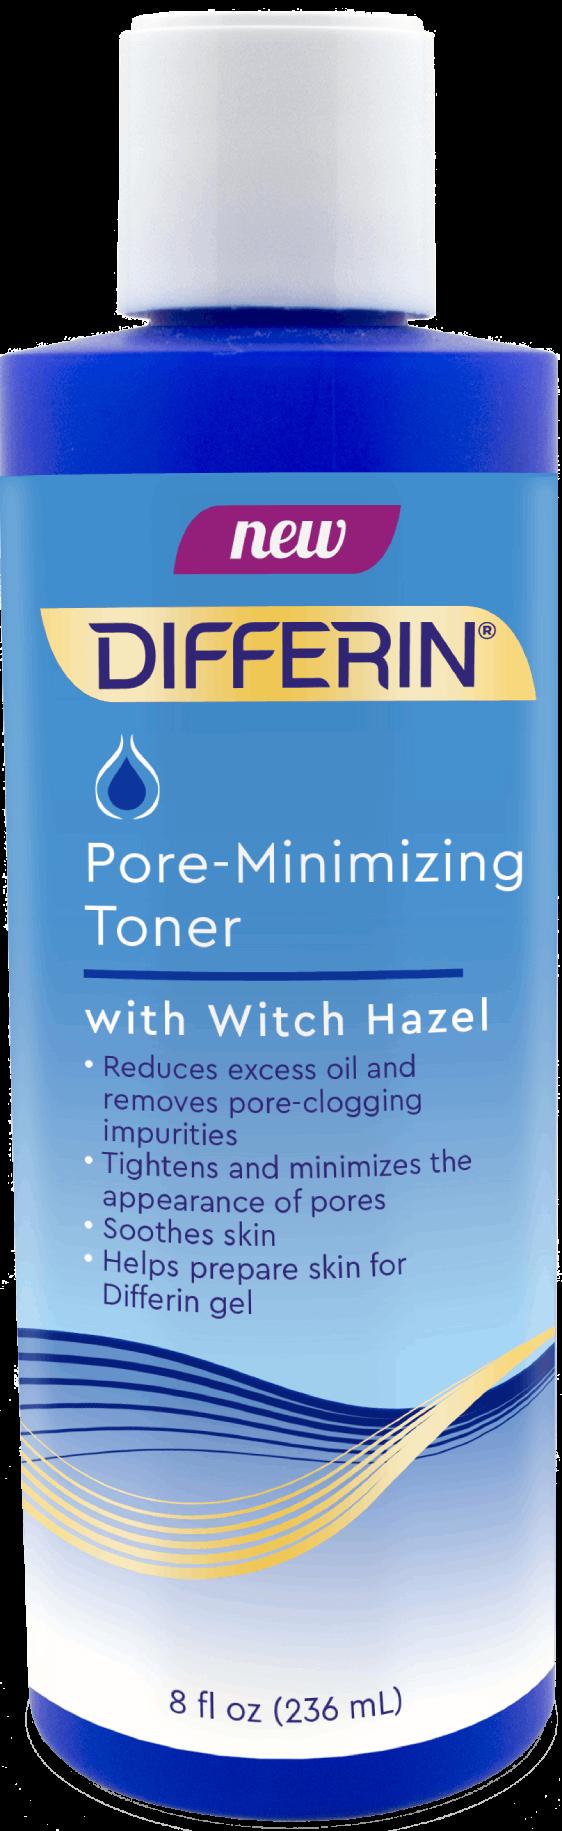 Differin® Pore-Minimizing Toner With Witch Hazel